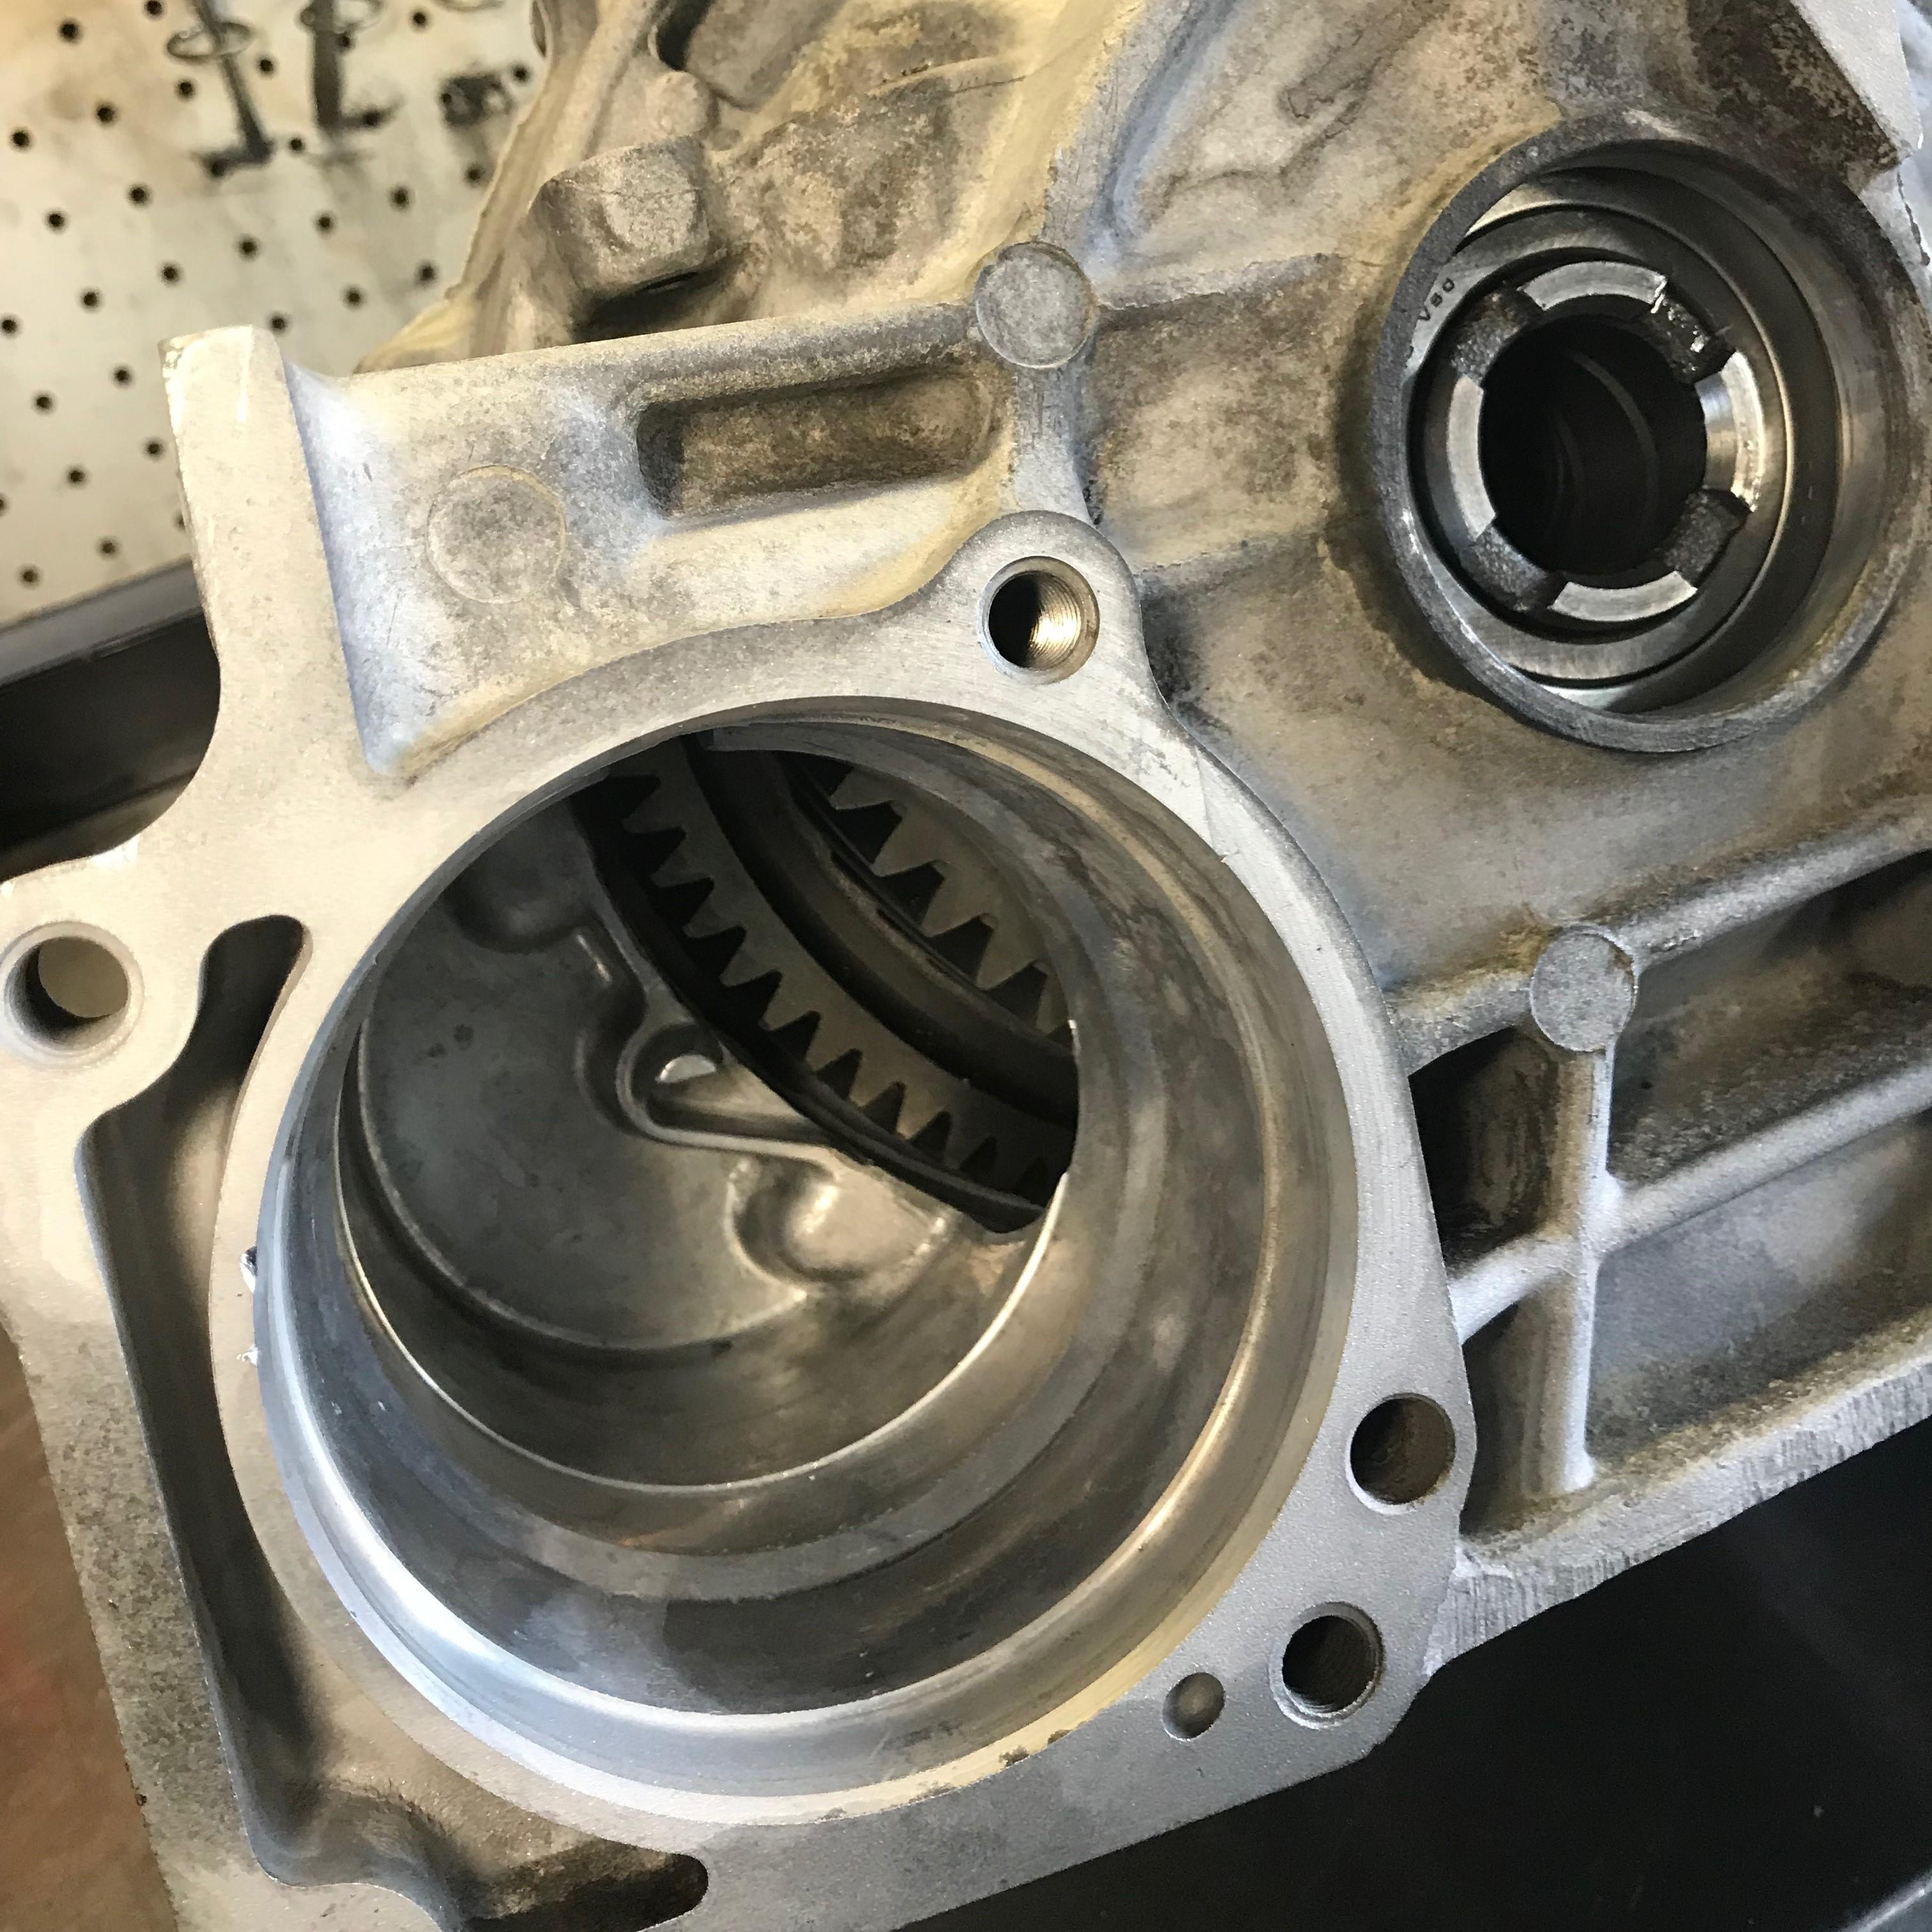 Honda AWD K-Series GearX STREET / Track Manual Transmission Rebuild